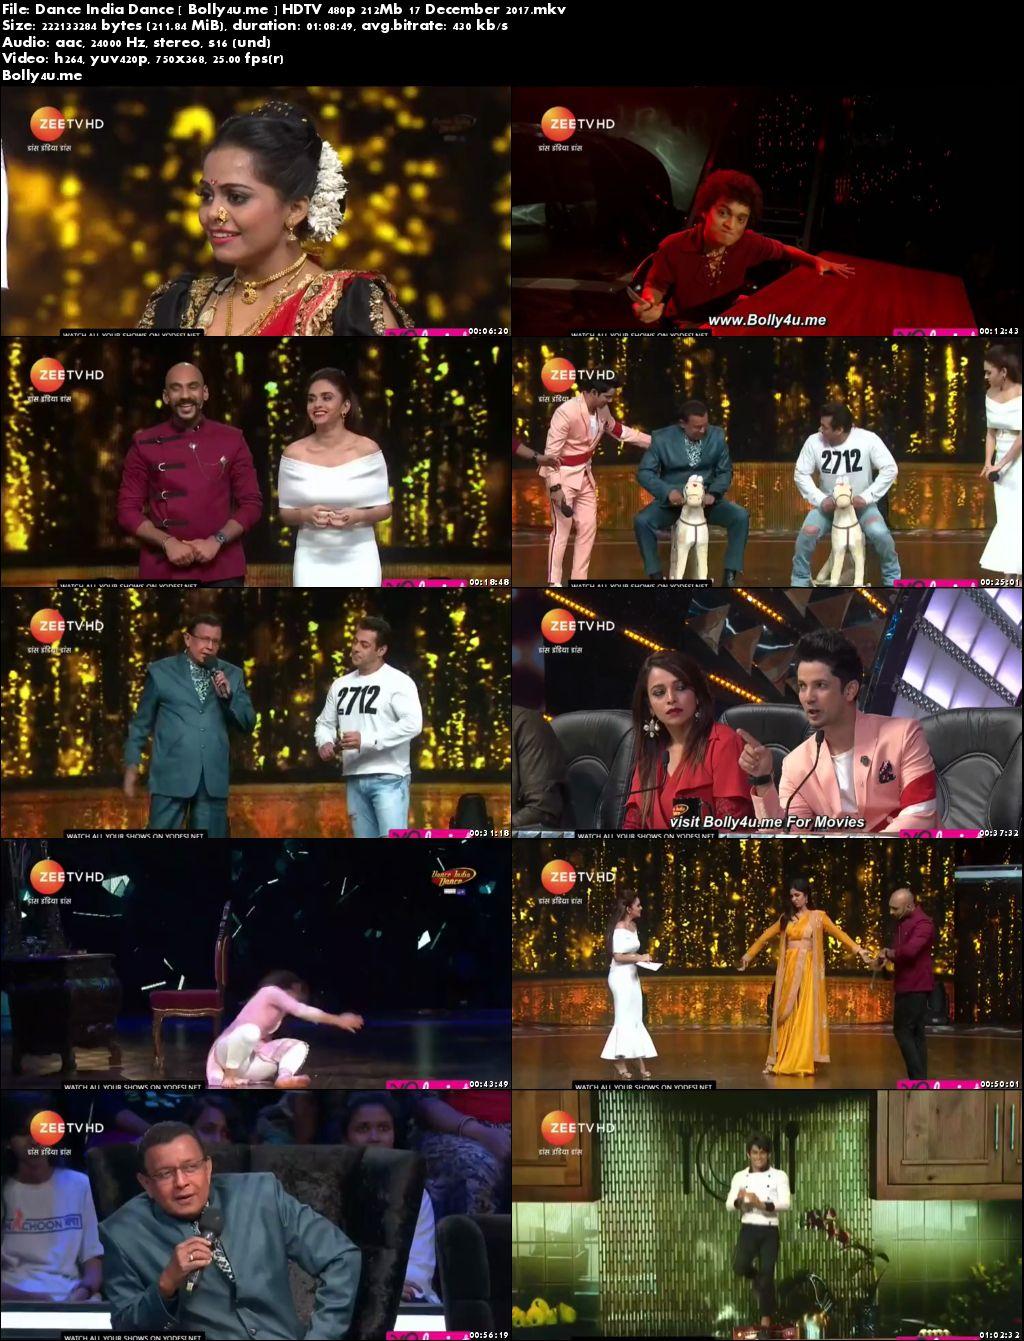 Dance India Dance HDTV 480p 200Mb 17 Dec 2017 Download